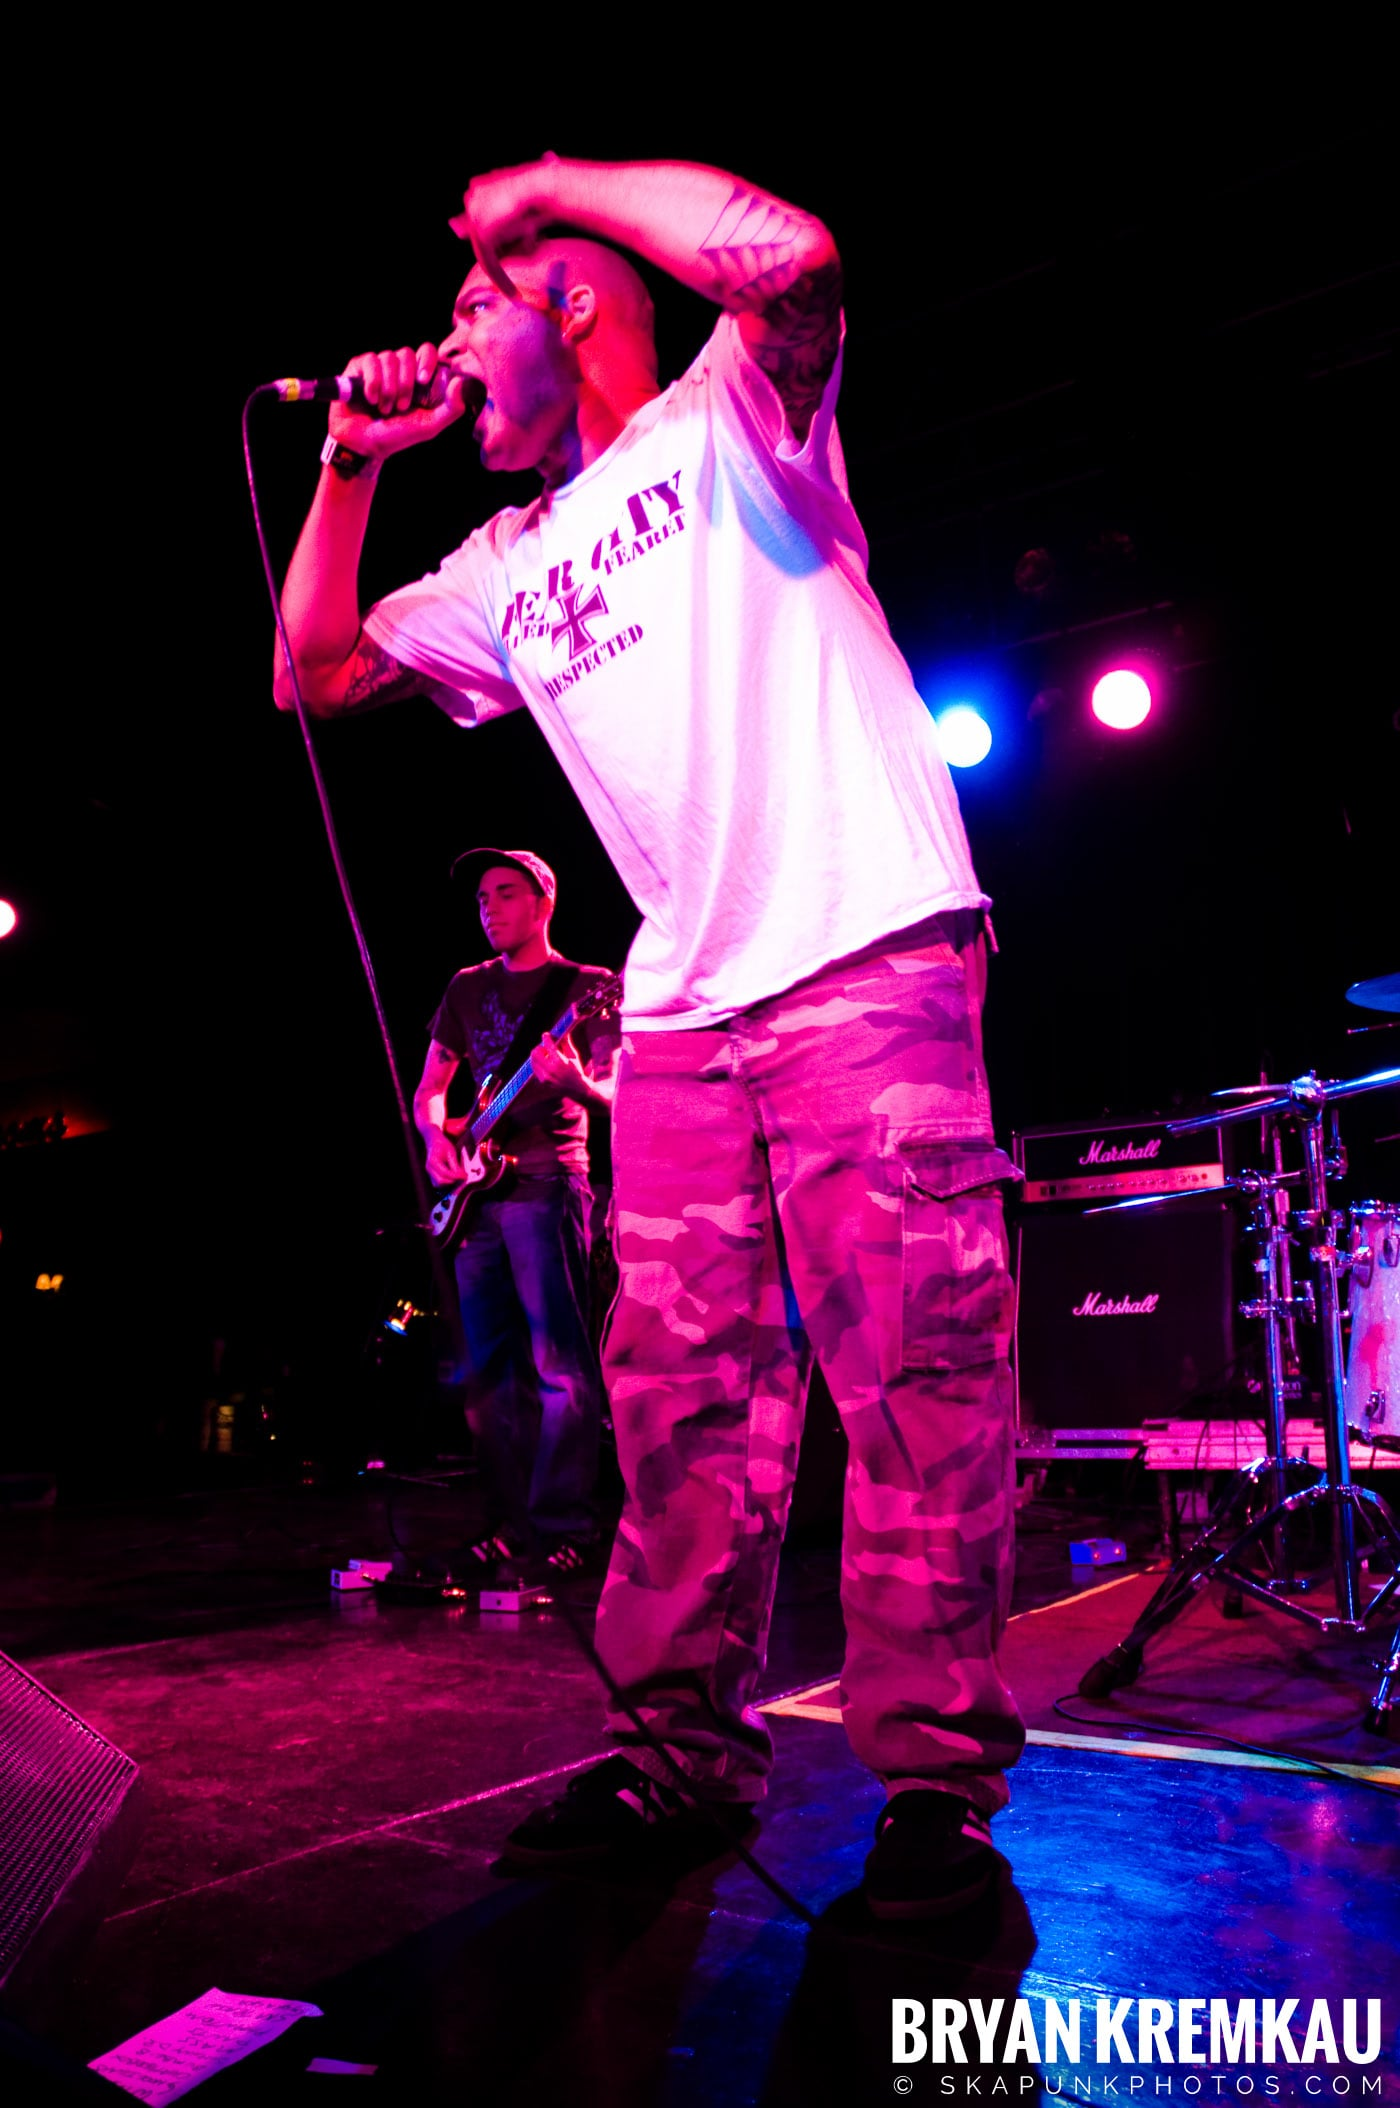 Hub City Stompers (Ska is Dead Tour) @ Starland Ballroom, Sayreville, NJ - 11.15.09 (4)